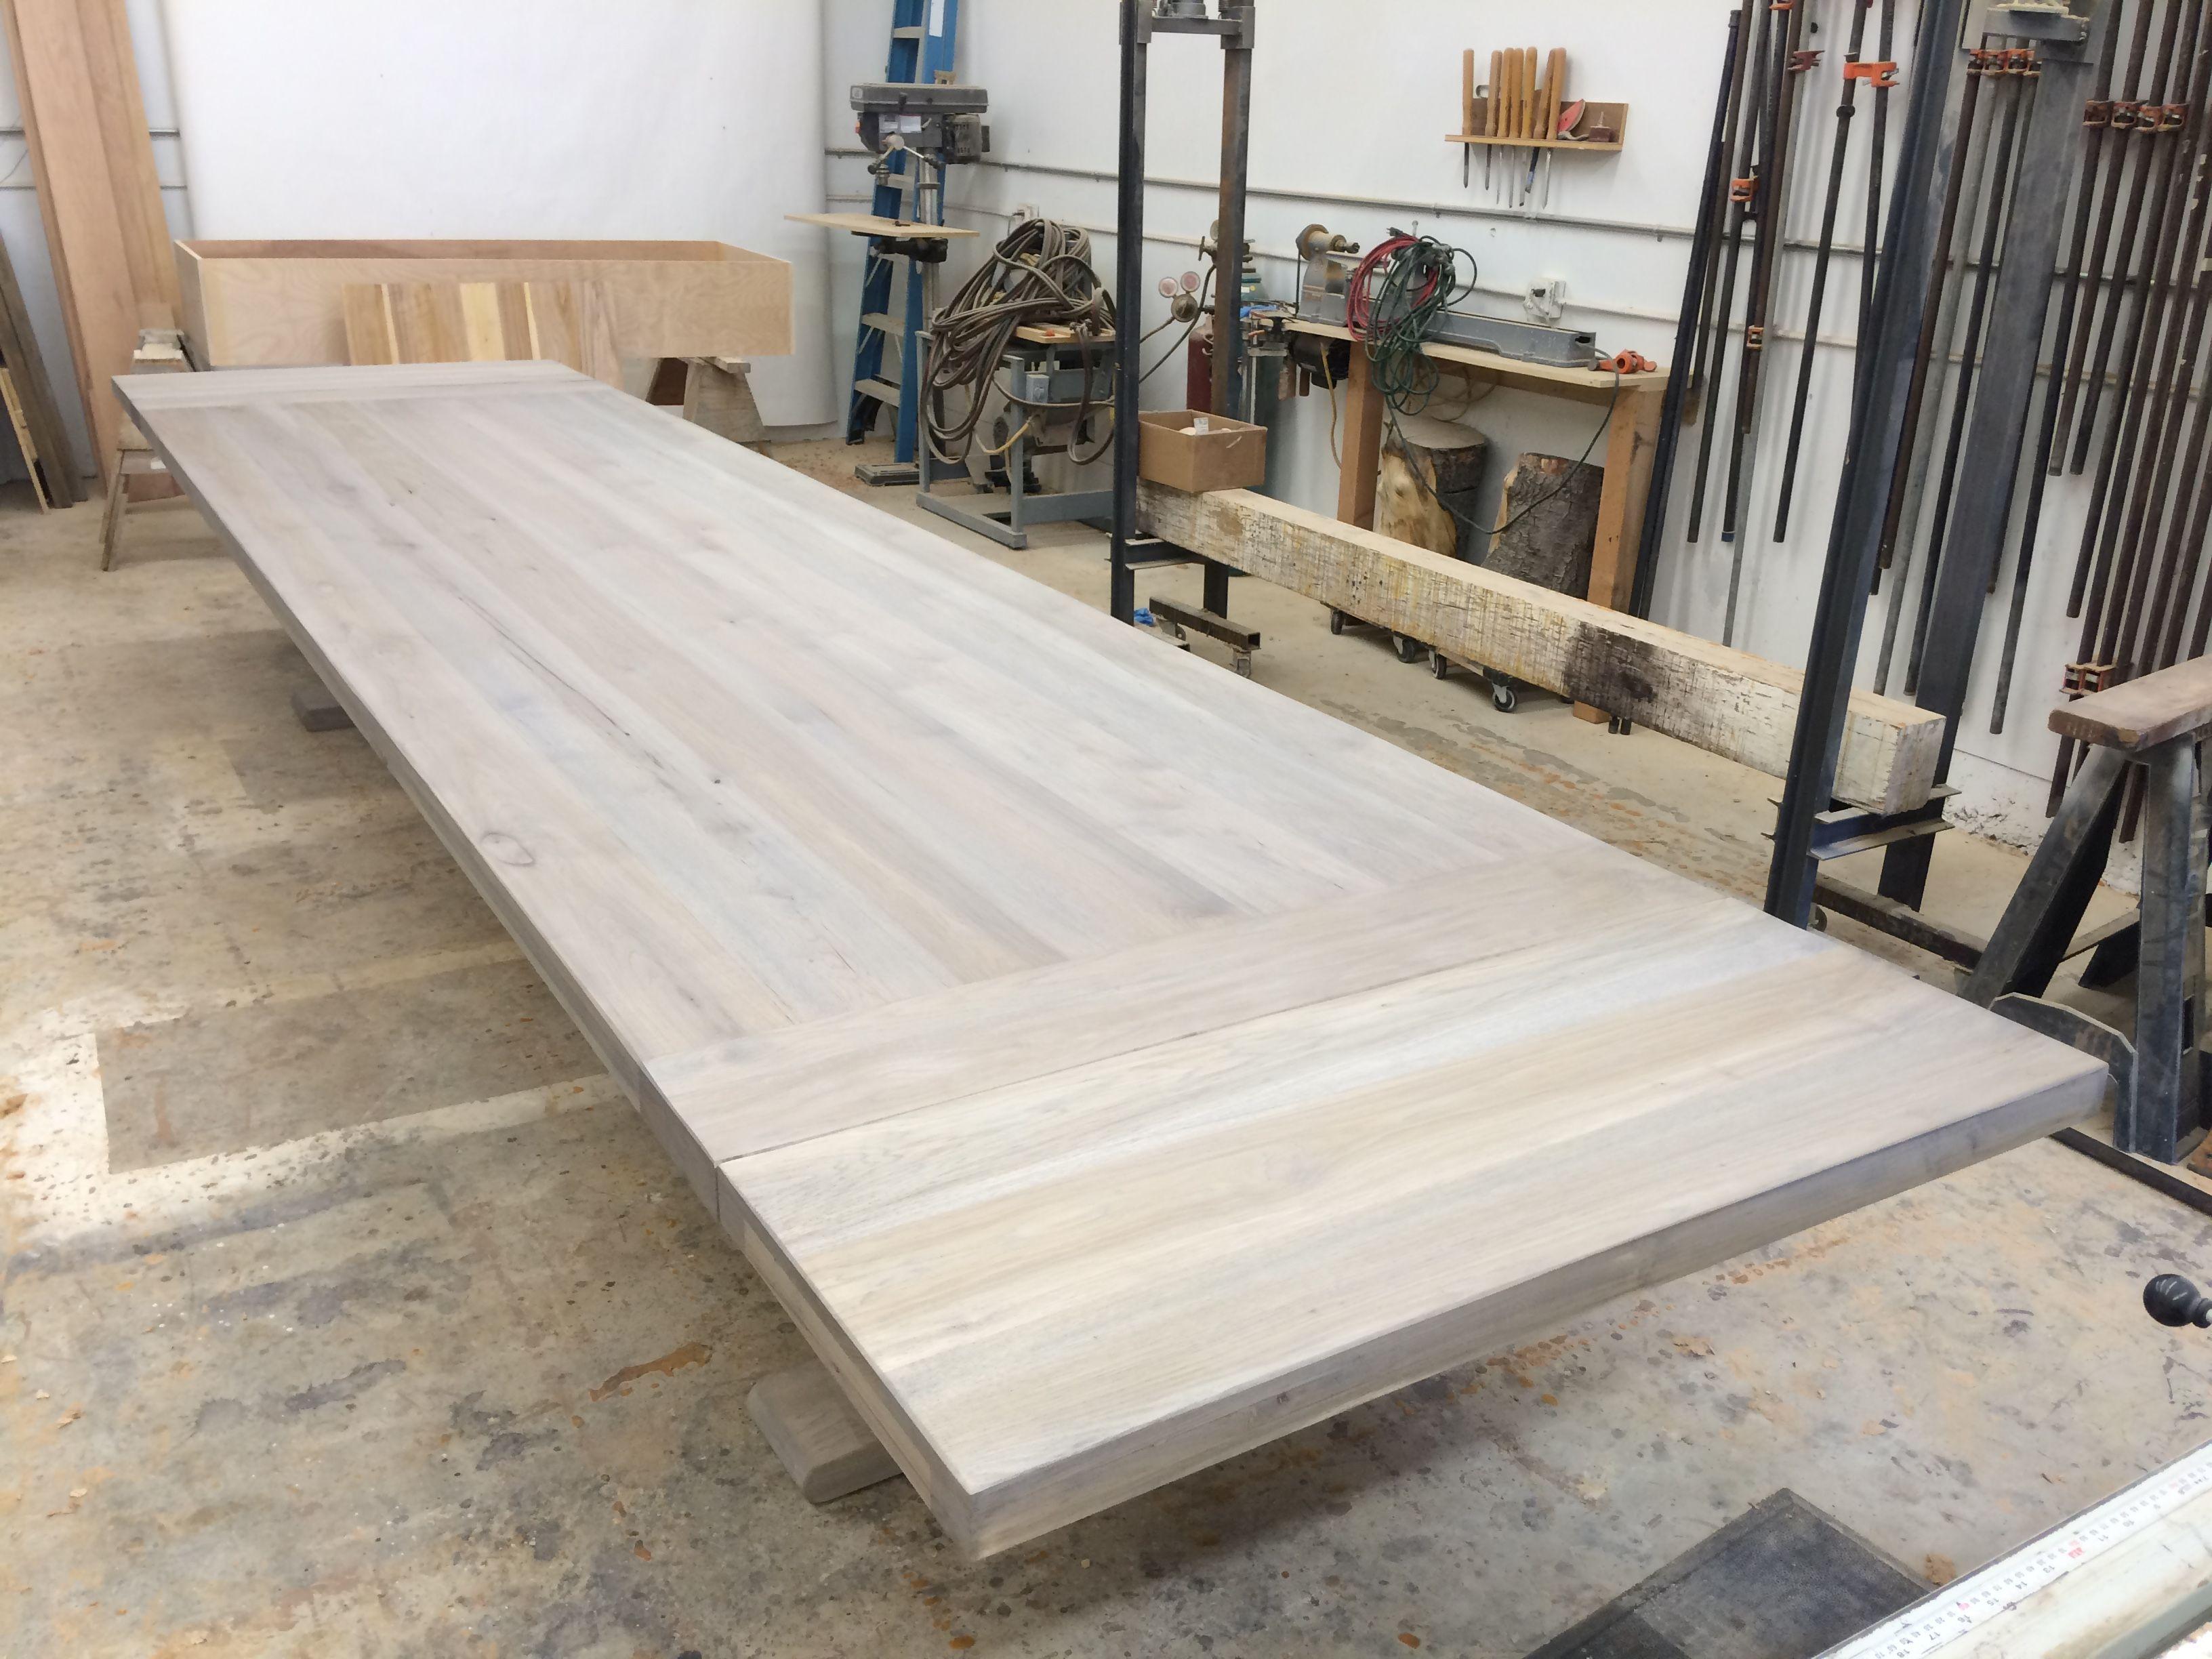 Custom Dining Table 14 Ft Trestle In Pecan Hardwood